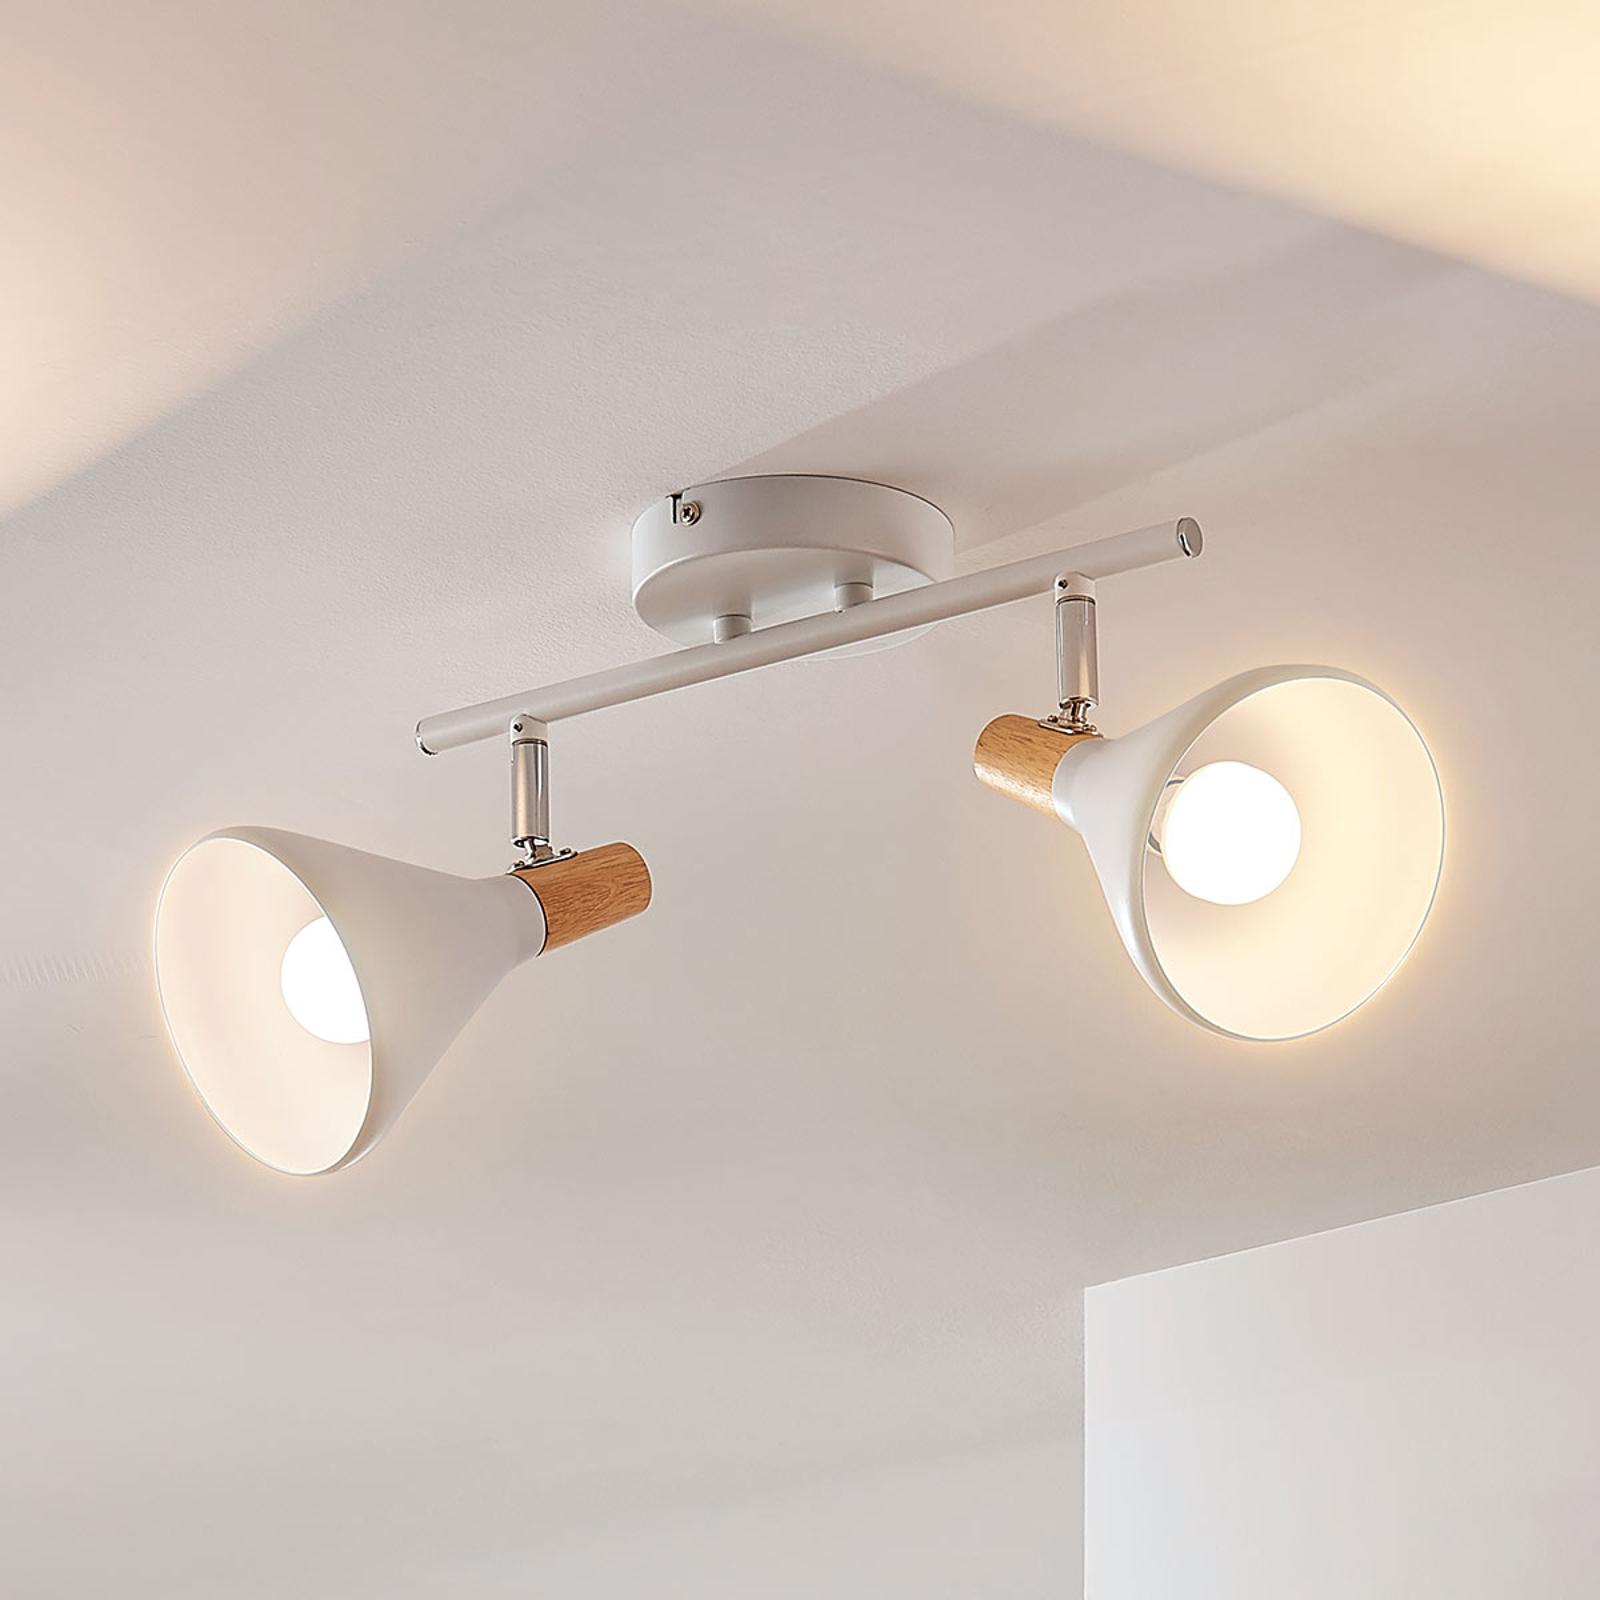 LED-Deckenlampe Arina in Weiß, 2-flammig